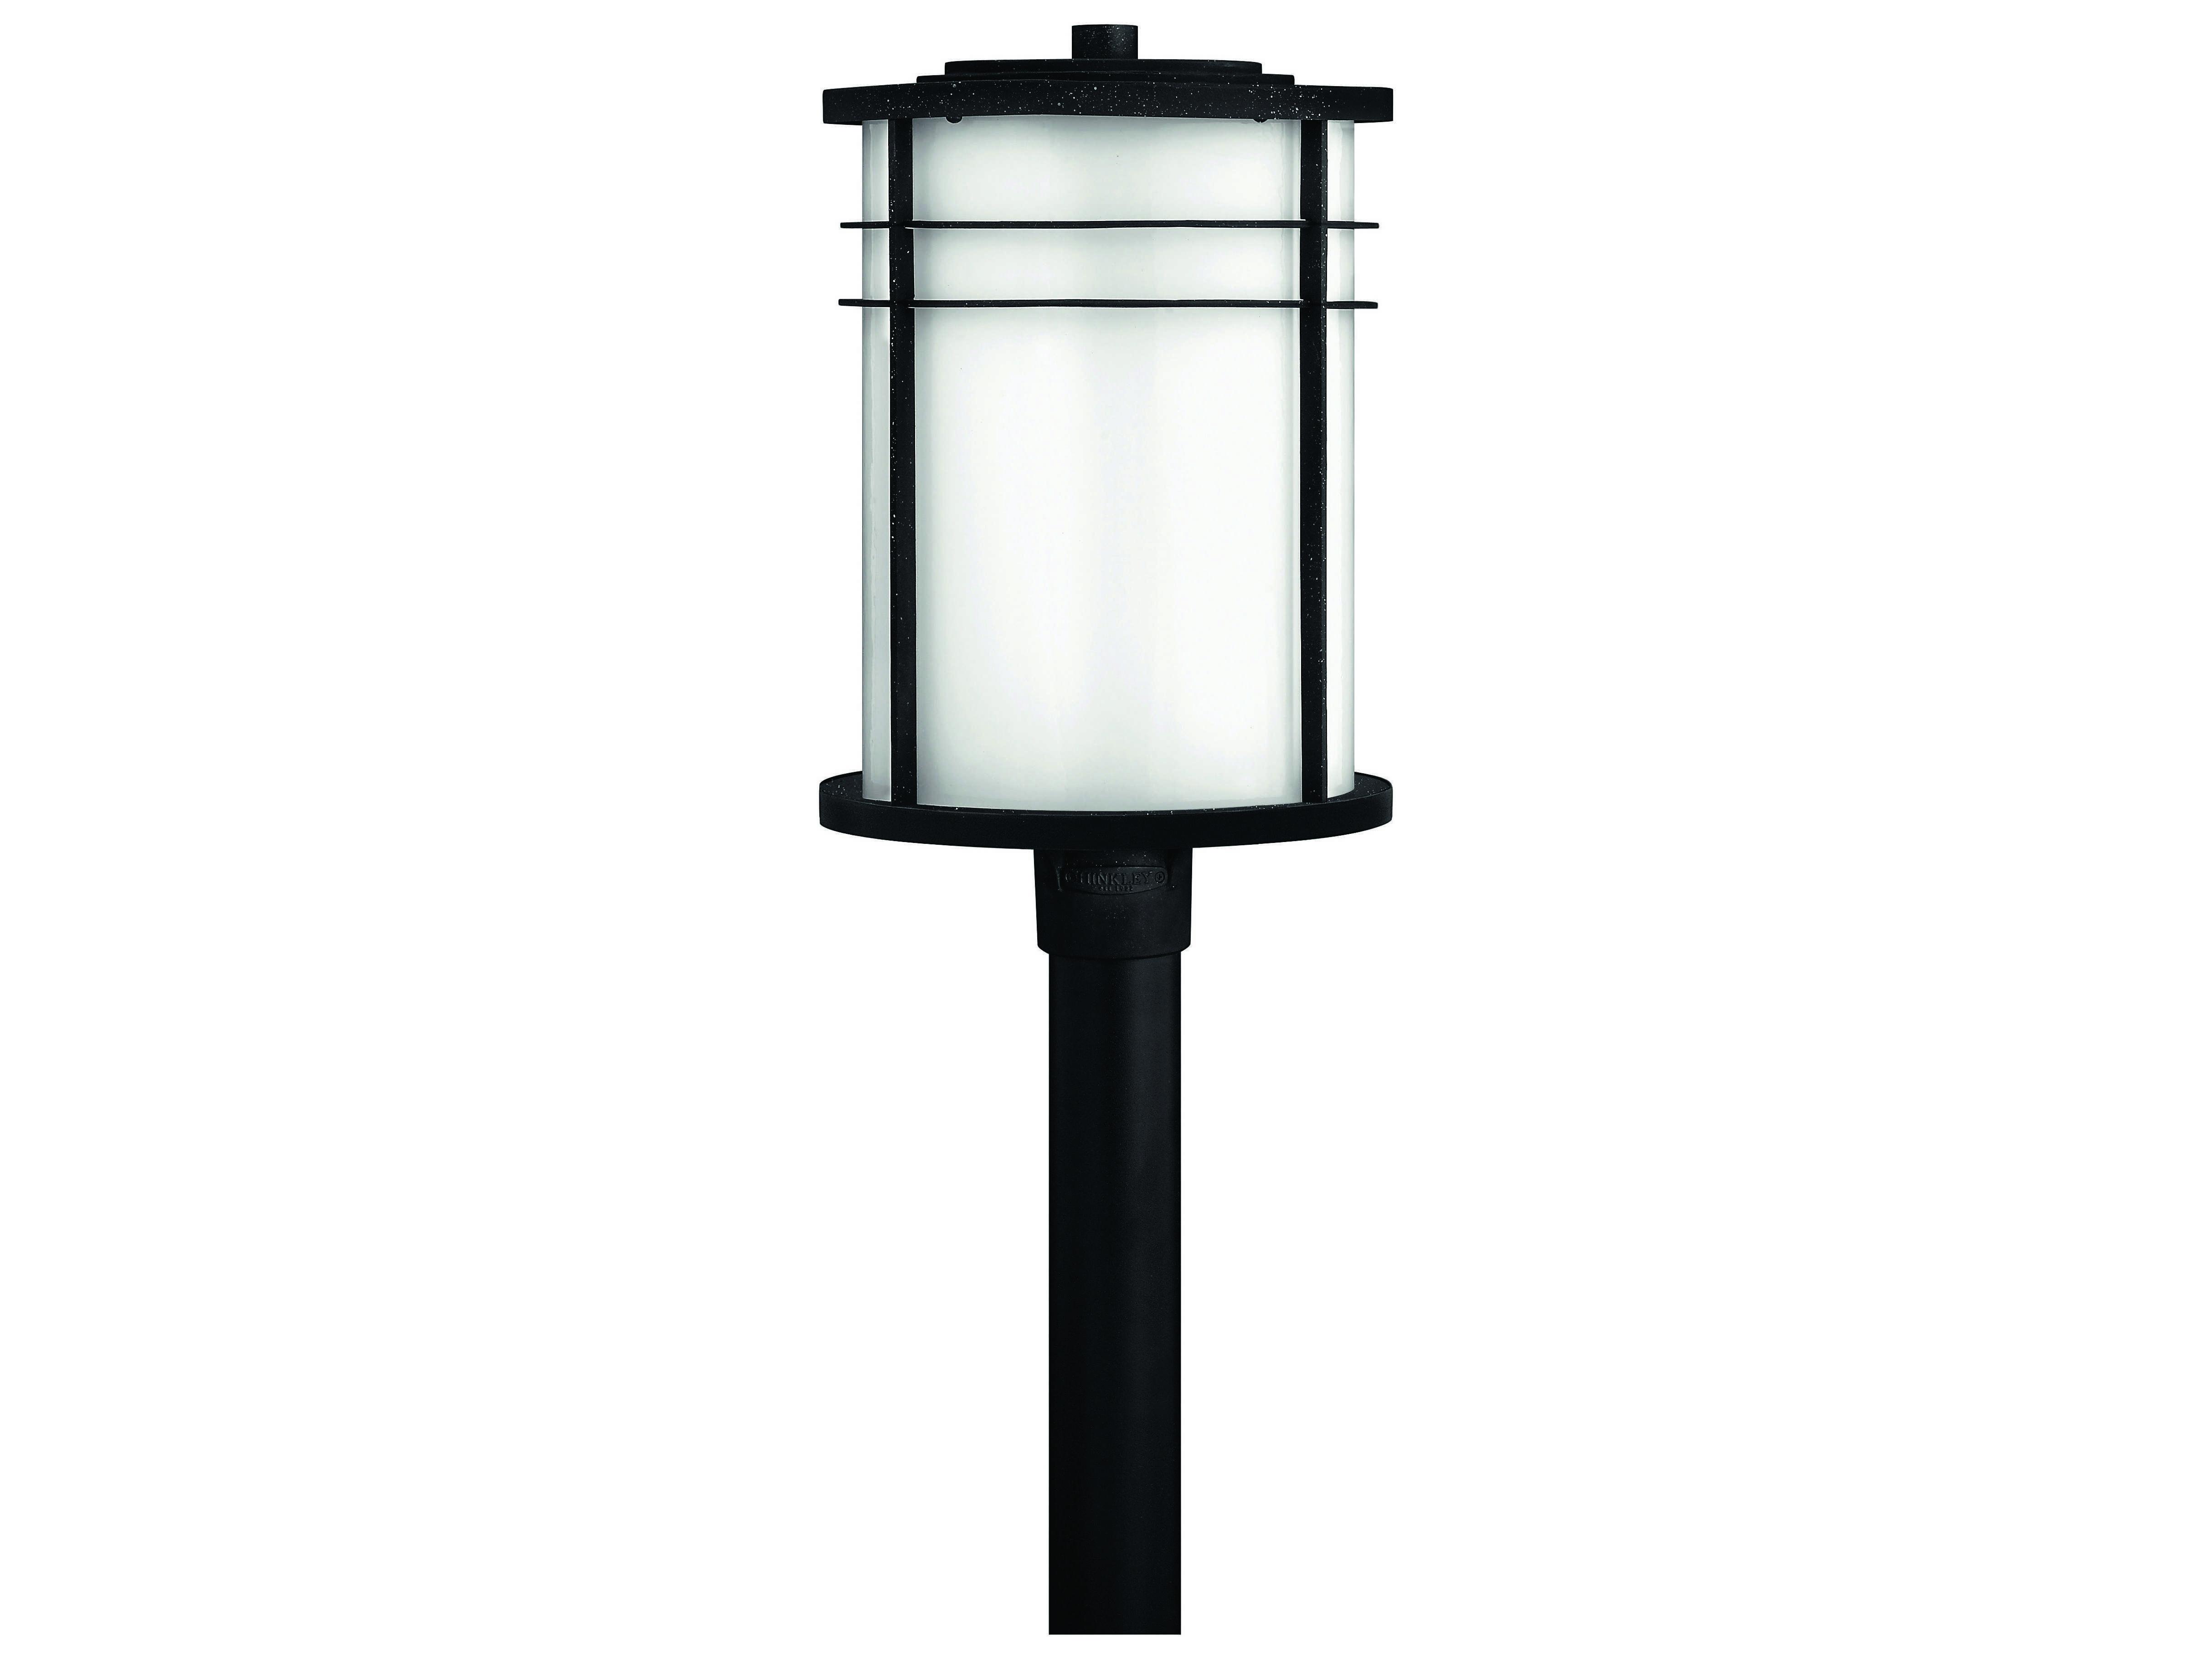 Hinkley Lighting Ledgewood Vintage Black CFL Outdoor Post Light 1121VK GU24